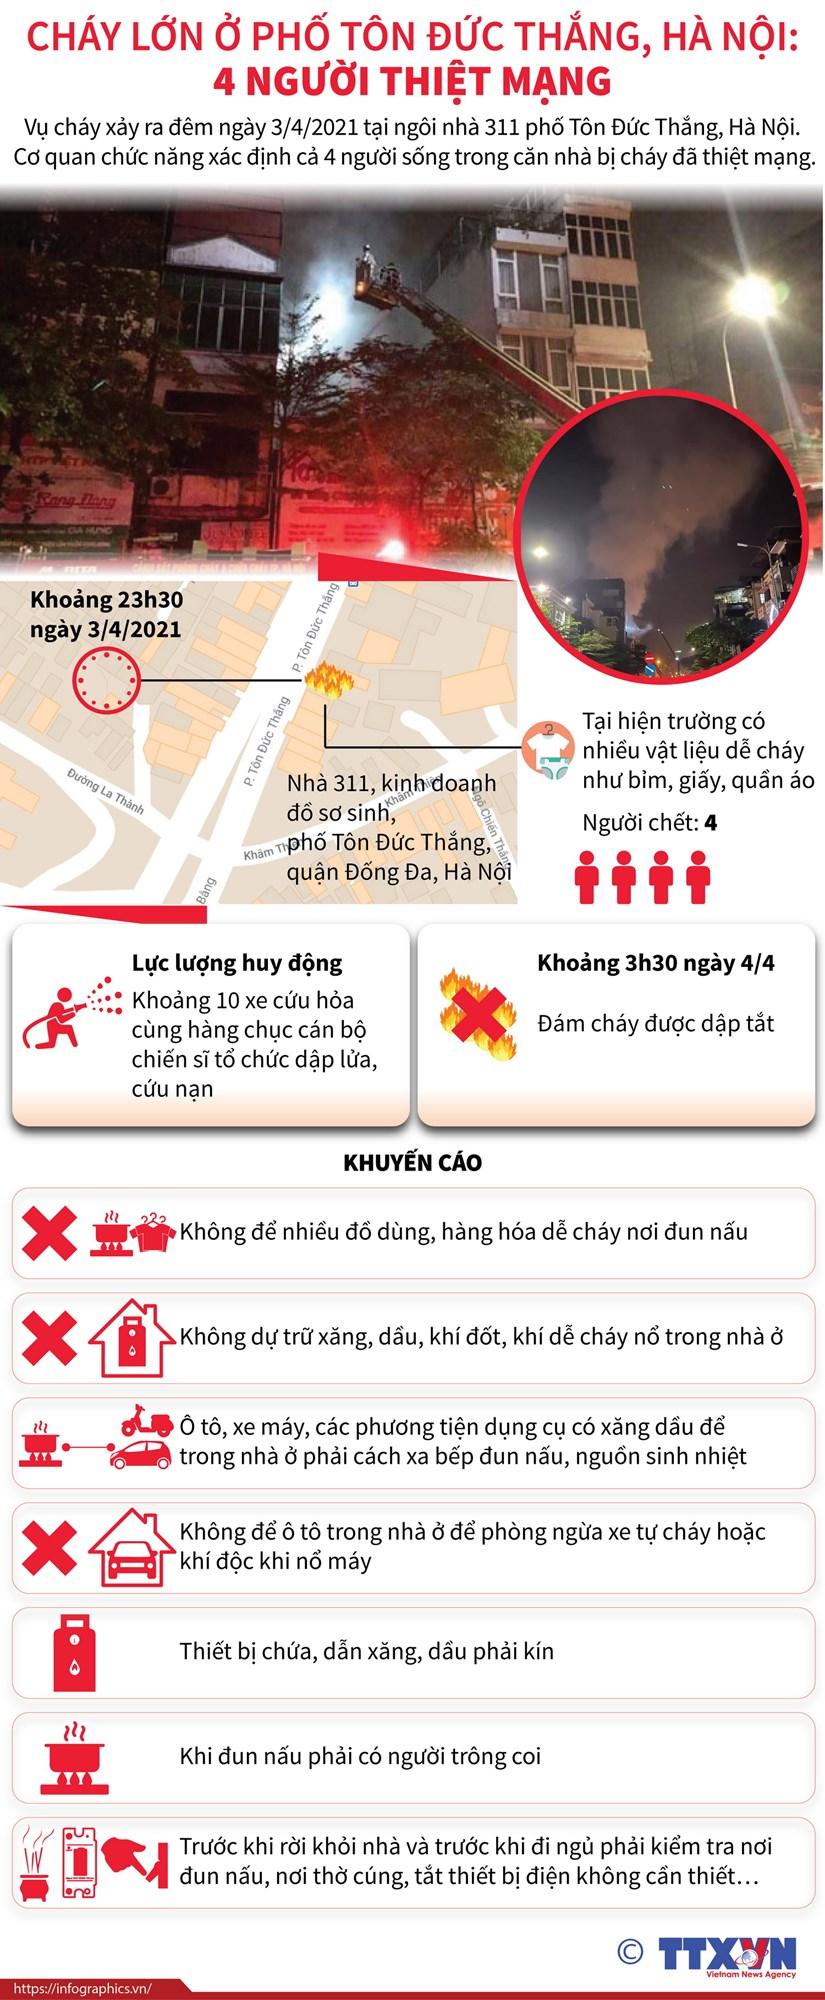 [Infographics] Vu chay lam 4 nguoi chet tren pho Ton Duc Thang hinh anh 1